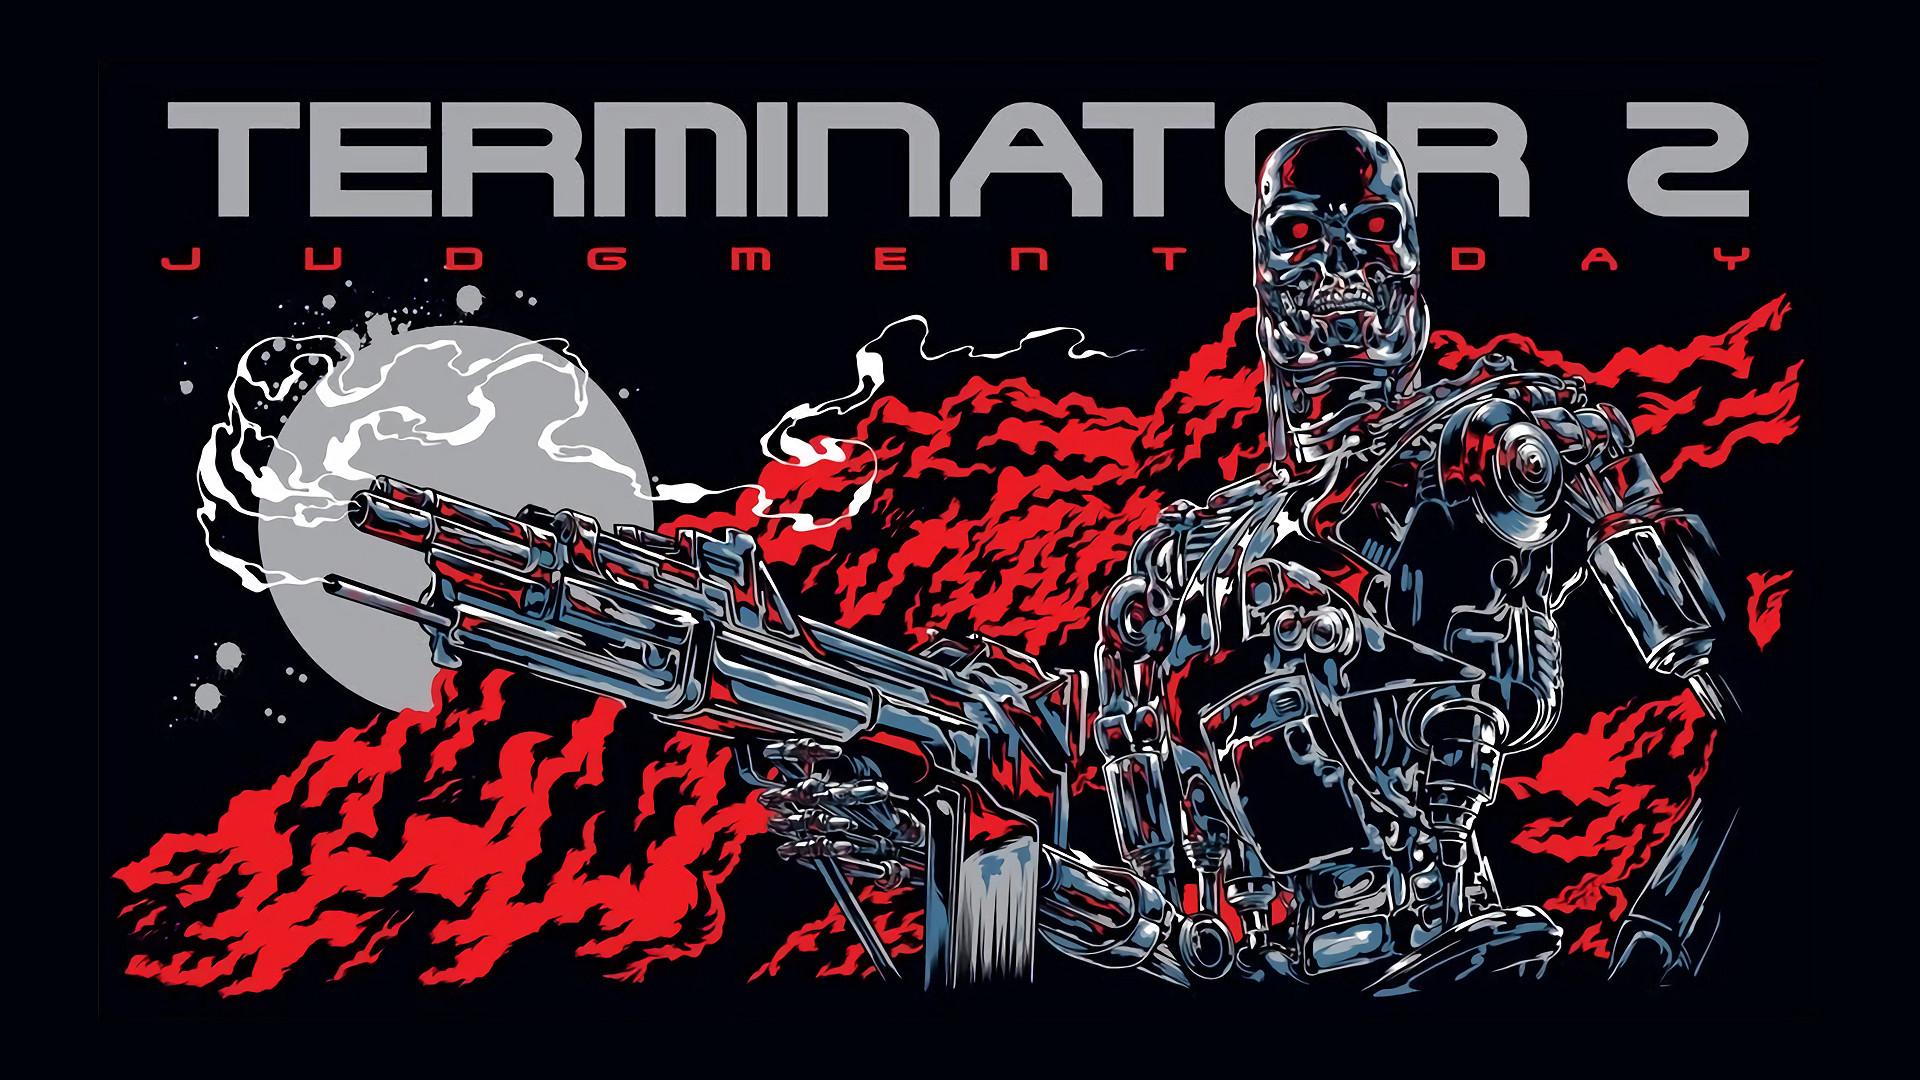 Res: 1920x1080, Cool Terminator 2 Fan Poster / Wallpaper